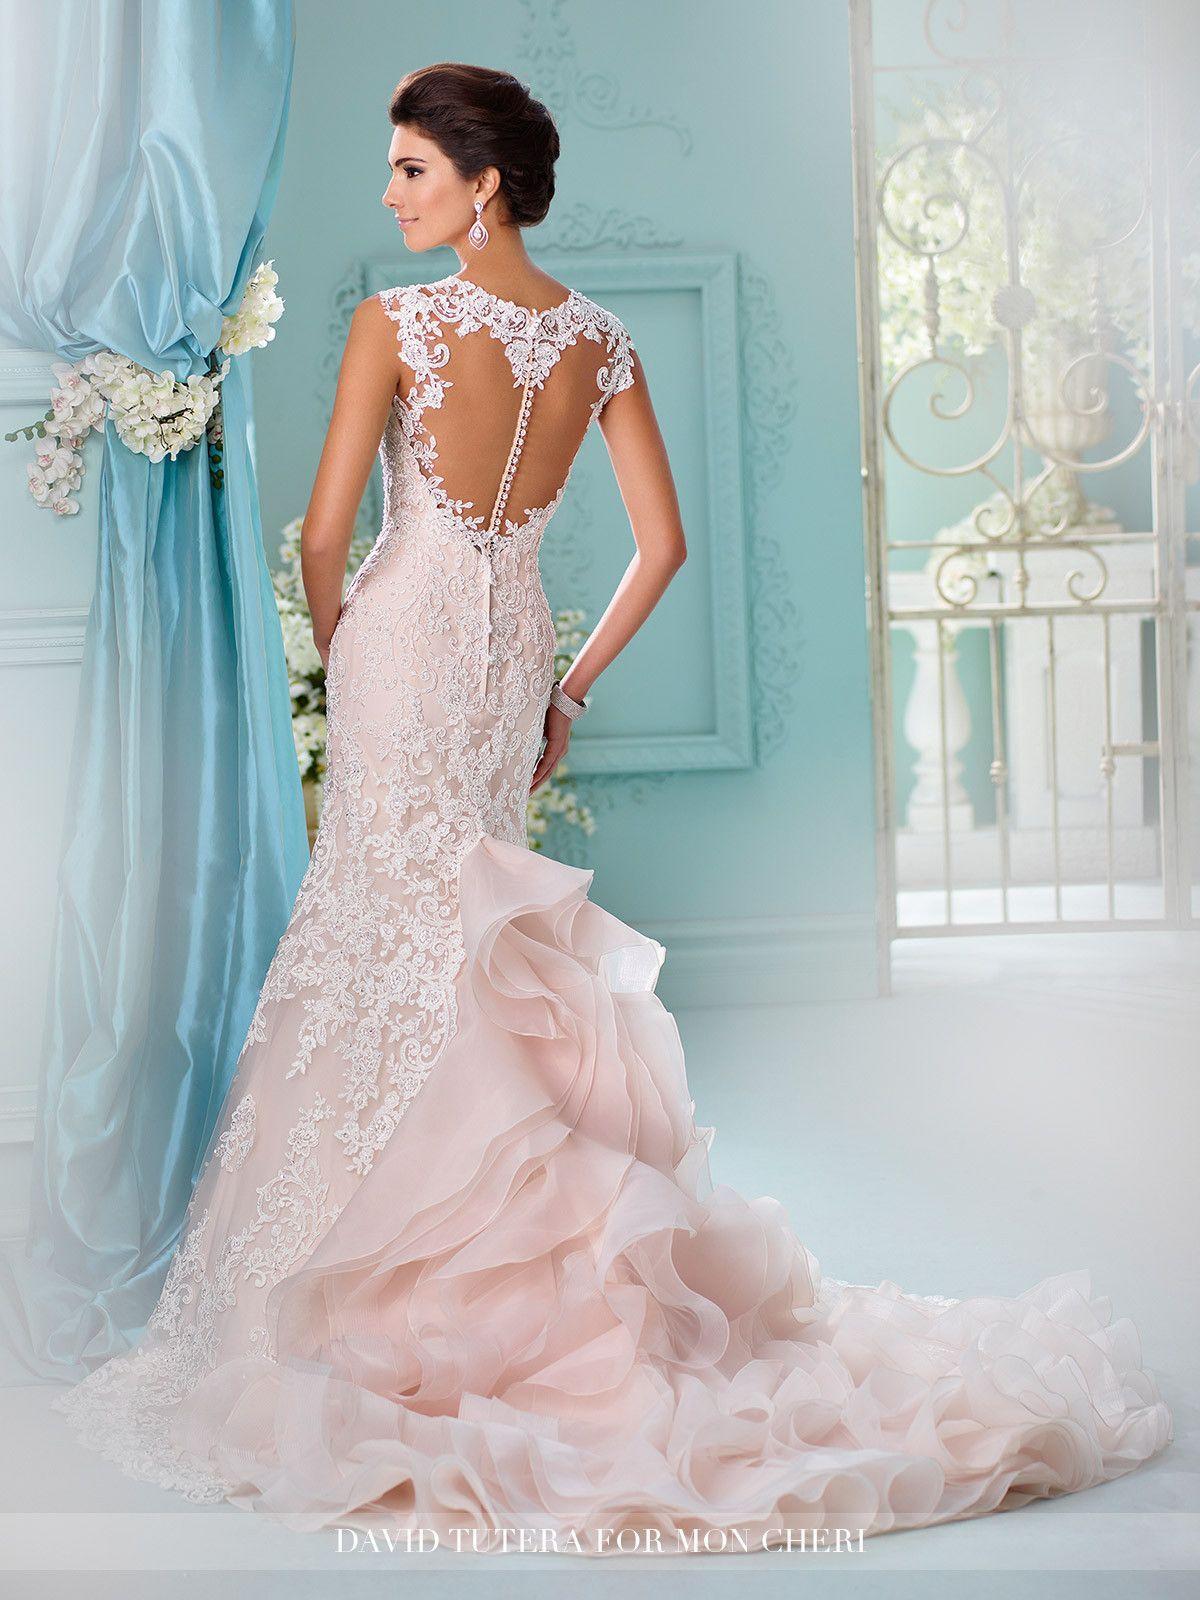 ADU Blog | David tutera, Bridal gowns and Gowns